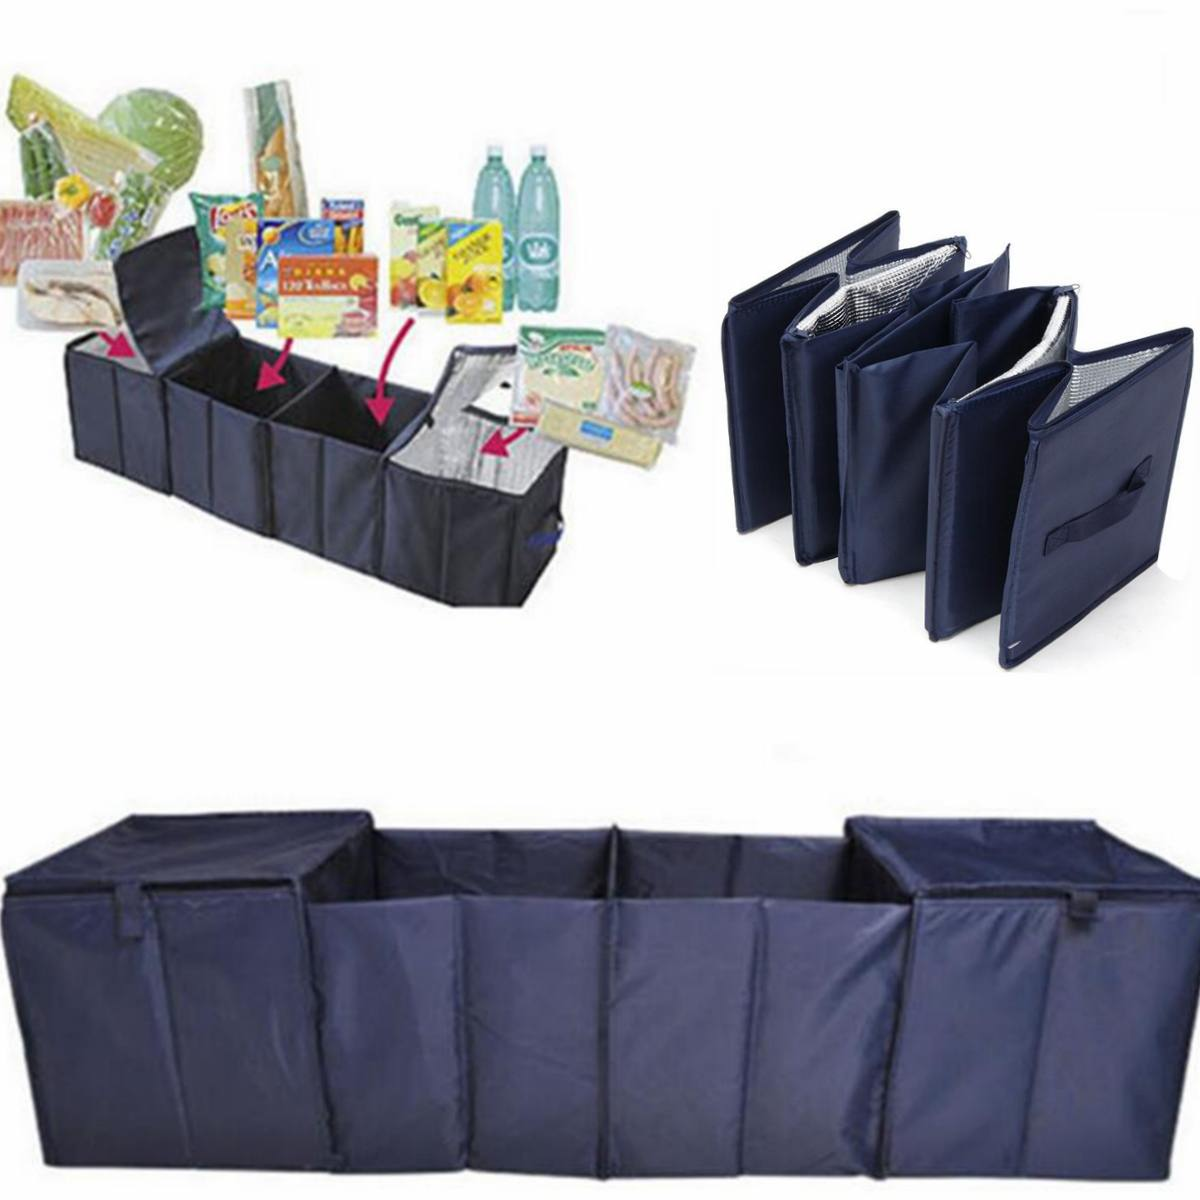 Foldable Car Trunk Boot Storage 4 Grid Collapsible Organizer Oxford Cloth Aluminum Foil PVC Dark Blue